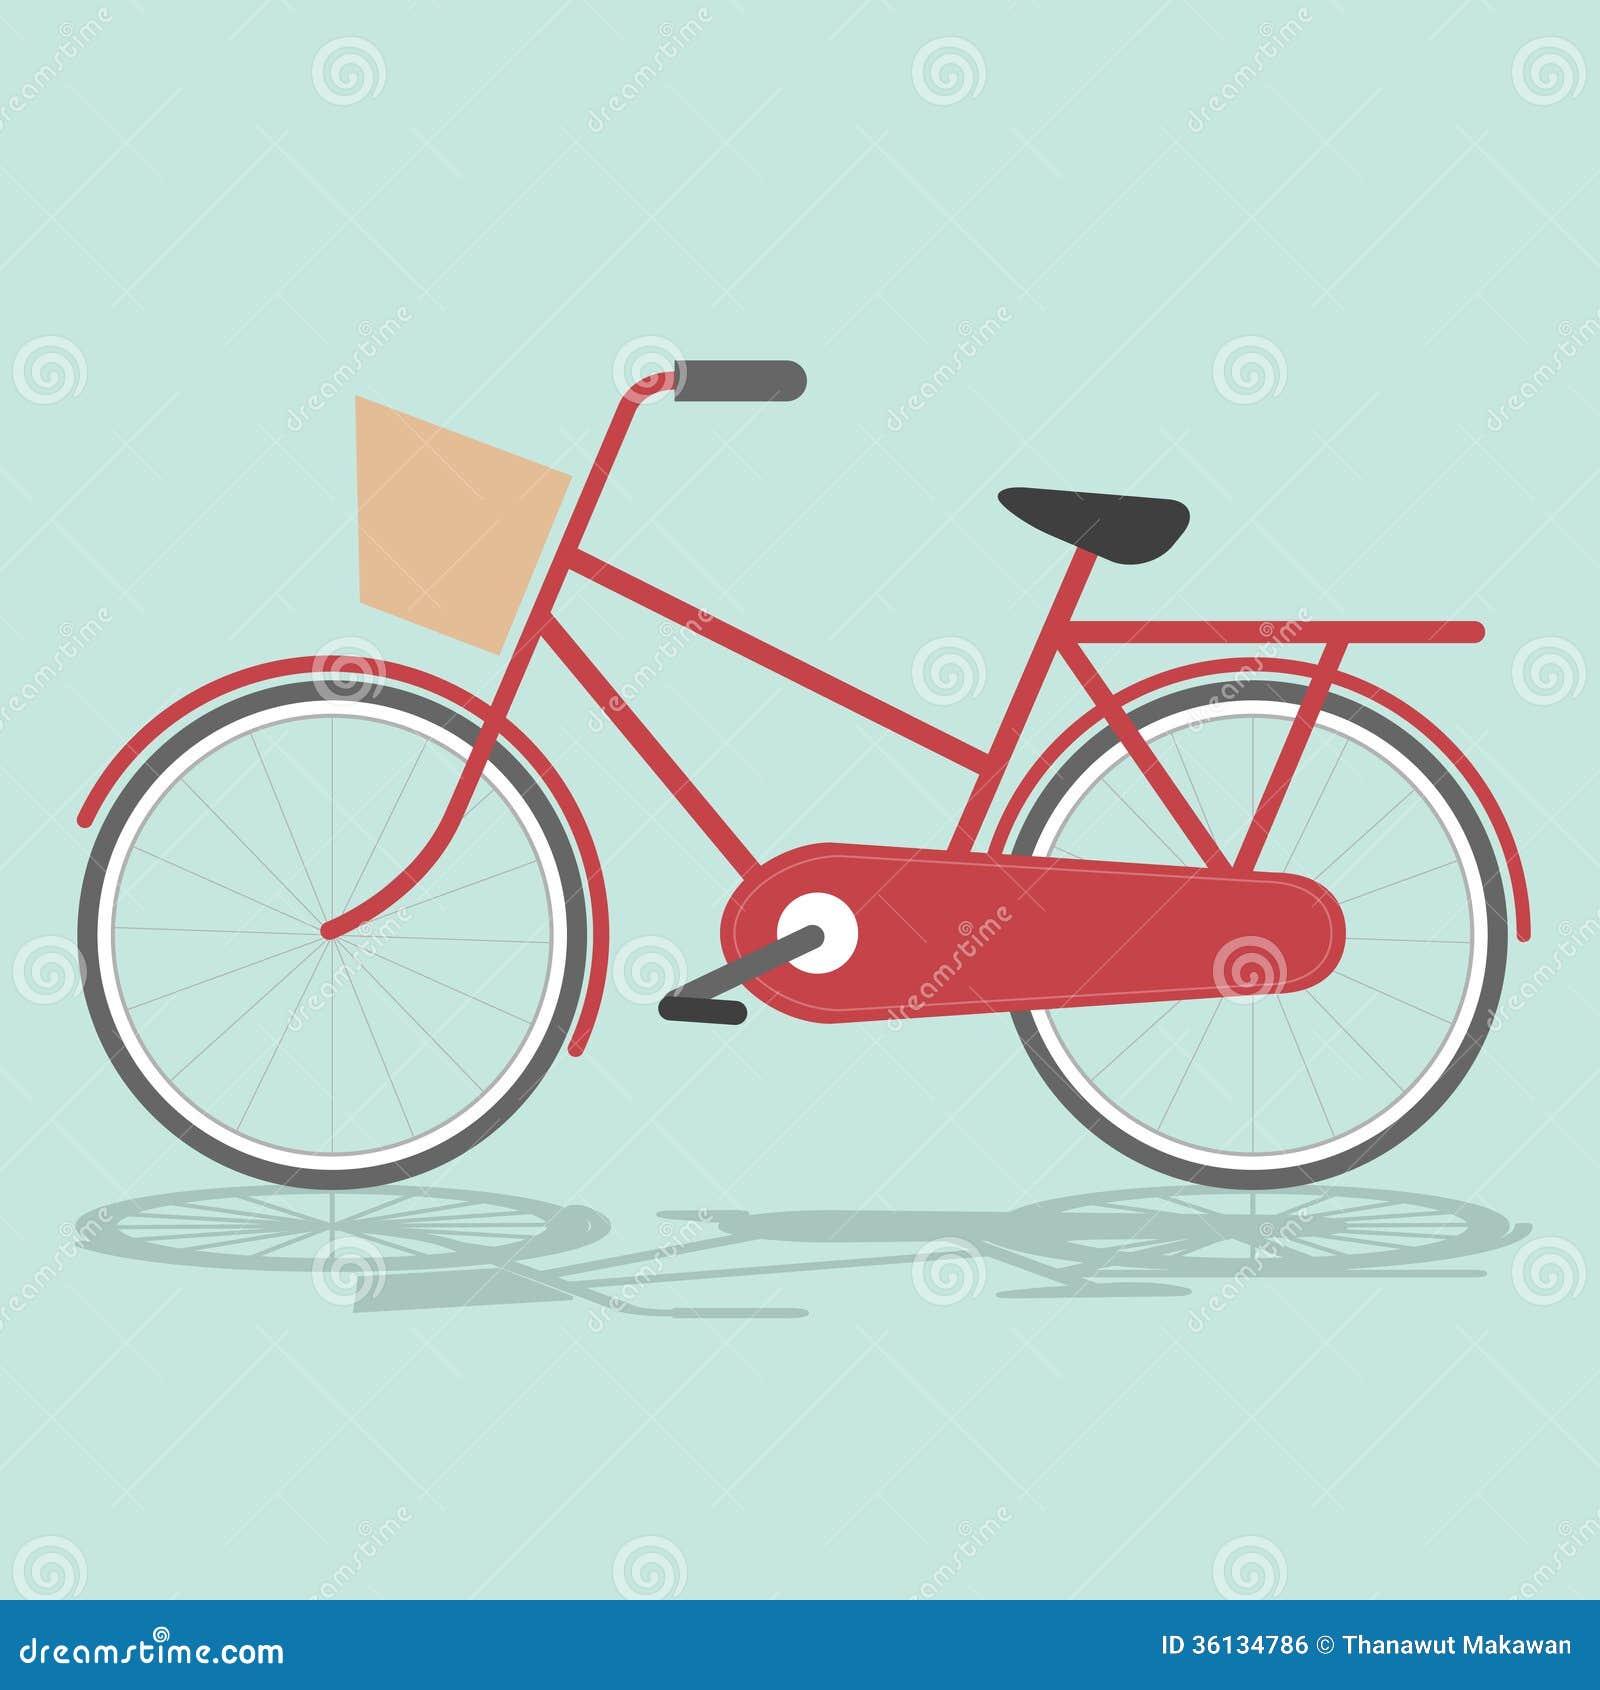 Vintage bicycle royalty free stock image image 36134786 for Illustration minimaliste